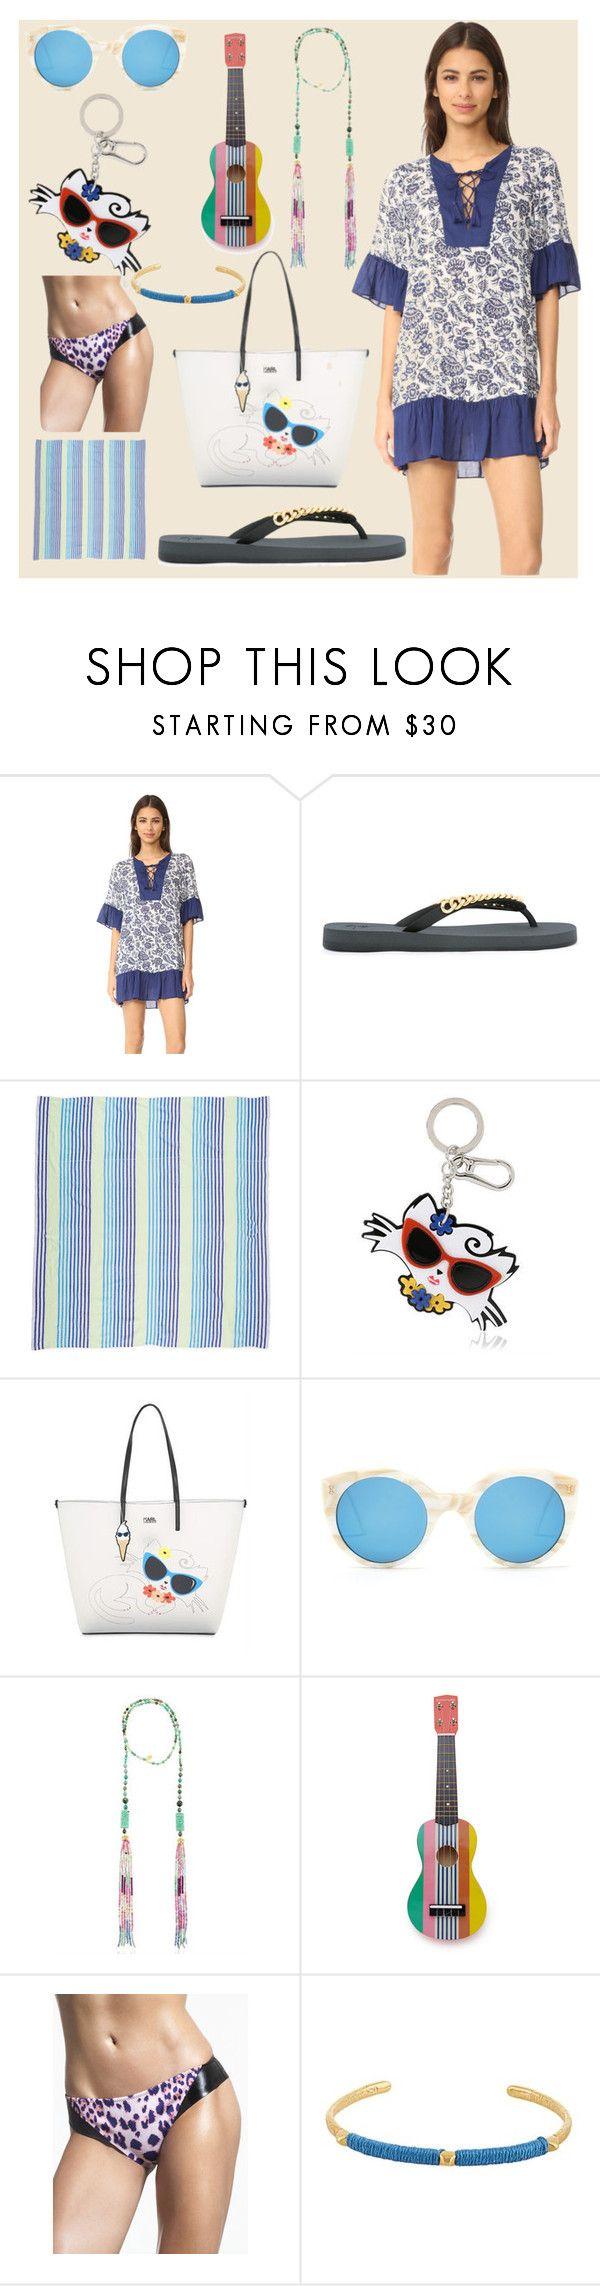 """Beach fashion sale"" by camry-brynn ❤ liked on Polyvore featuring Parker, Giuseppe Zanotti, Las Bayadas, Karl Lagerfeld, Illesteva, Katerina Psoma, Sunnylife, Duskii and Marte Frisnes"